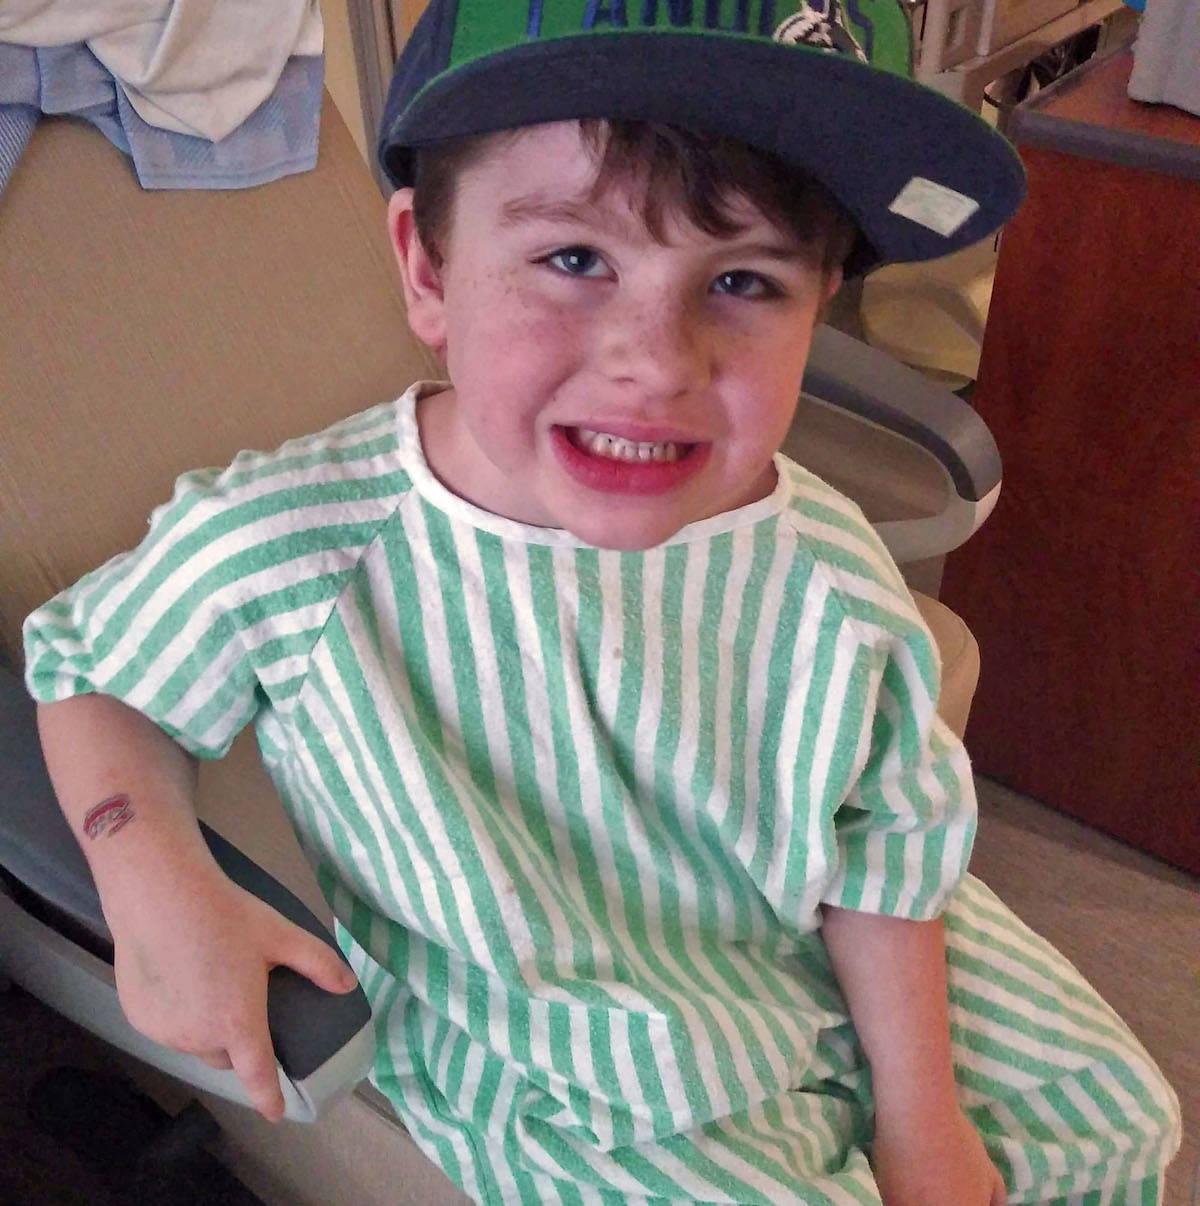 Aldergrove comes together for five-year-old battling leukemia